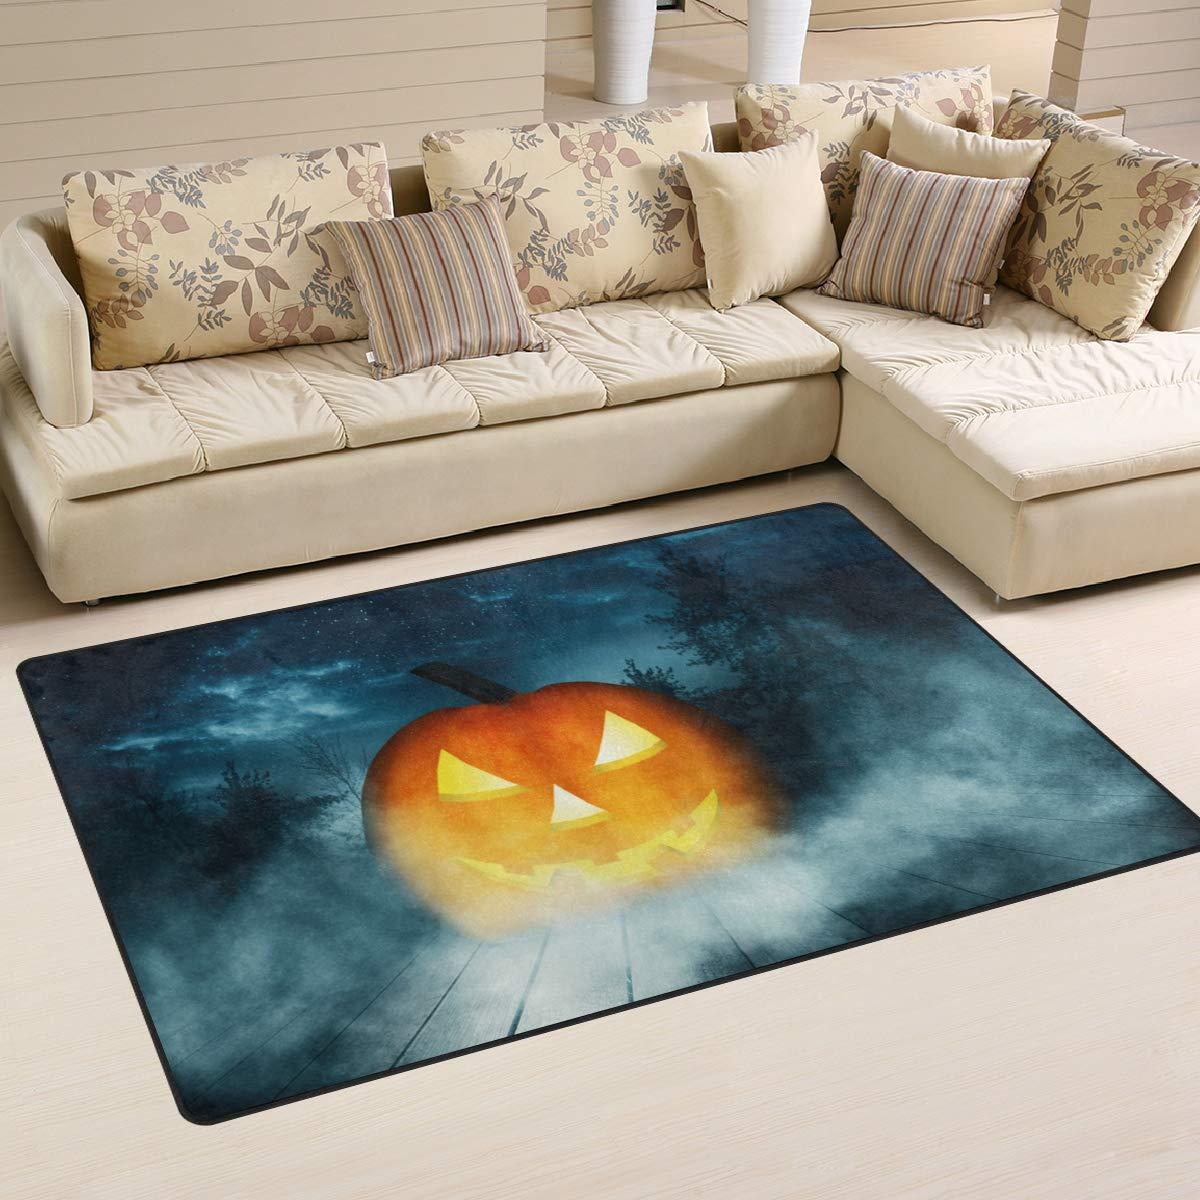 ALAZA Pumpkin Halloween Wooden Non Slip Area Rug 2' x 3', Modern Floor Rugs Mat for Living Room Bedroom Dinning Room Home Decor